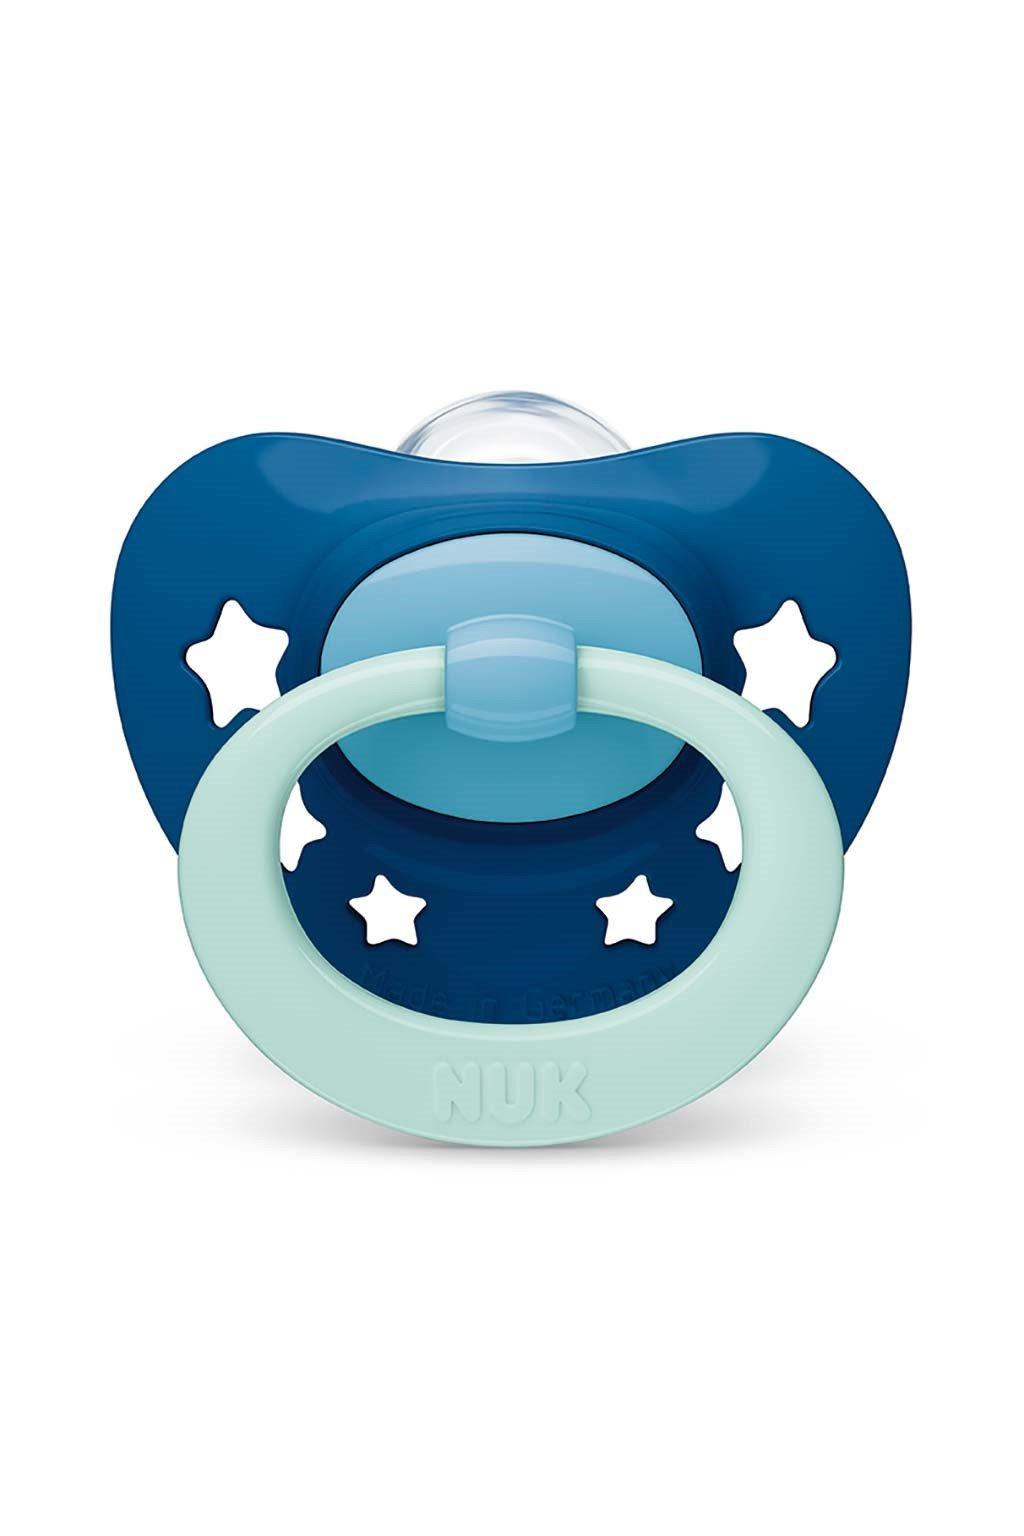 Dojčenský cumlík NUK Classic Signature 18-36m modrý star